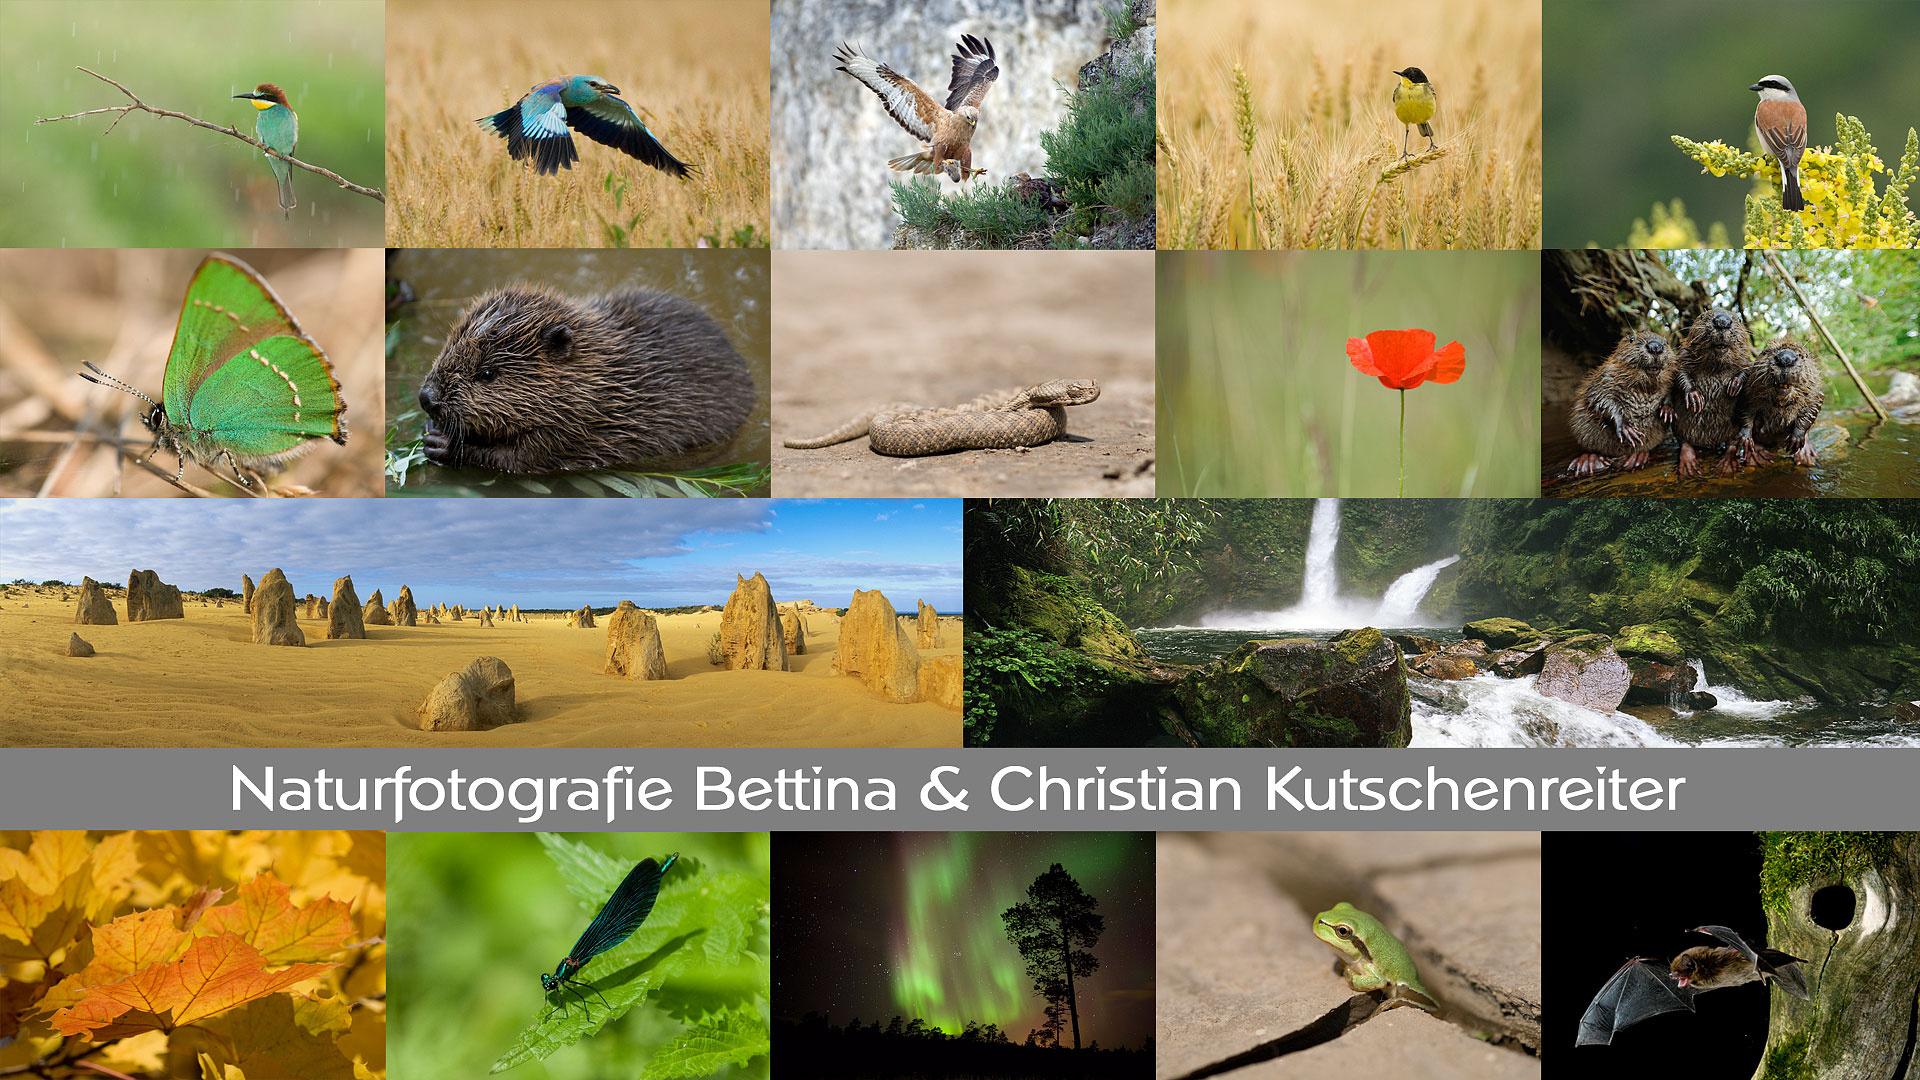 Kutschenreiter Naturfotografie Biber Zwergerl Insekten Pflanzen Säugetiere Vögel Makro Panorama Schmuck Mokume Gane